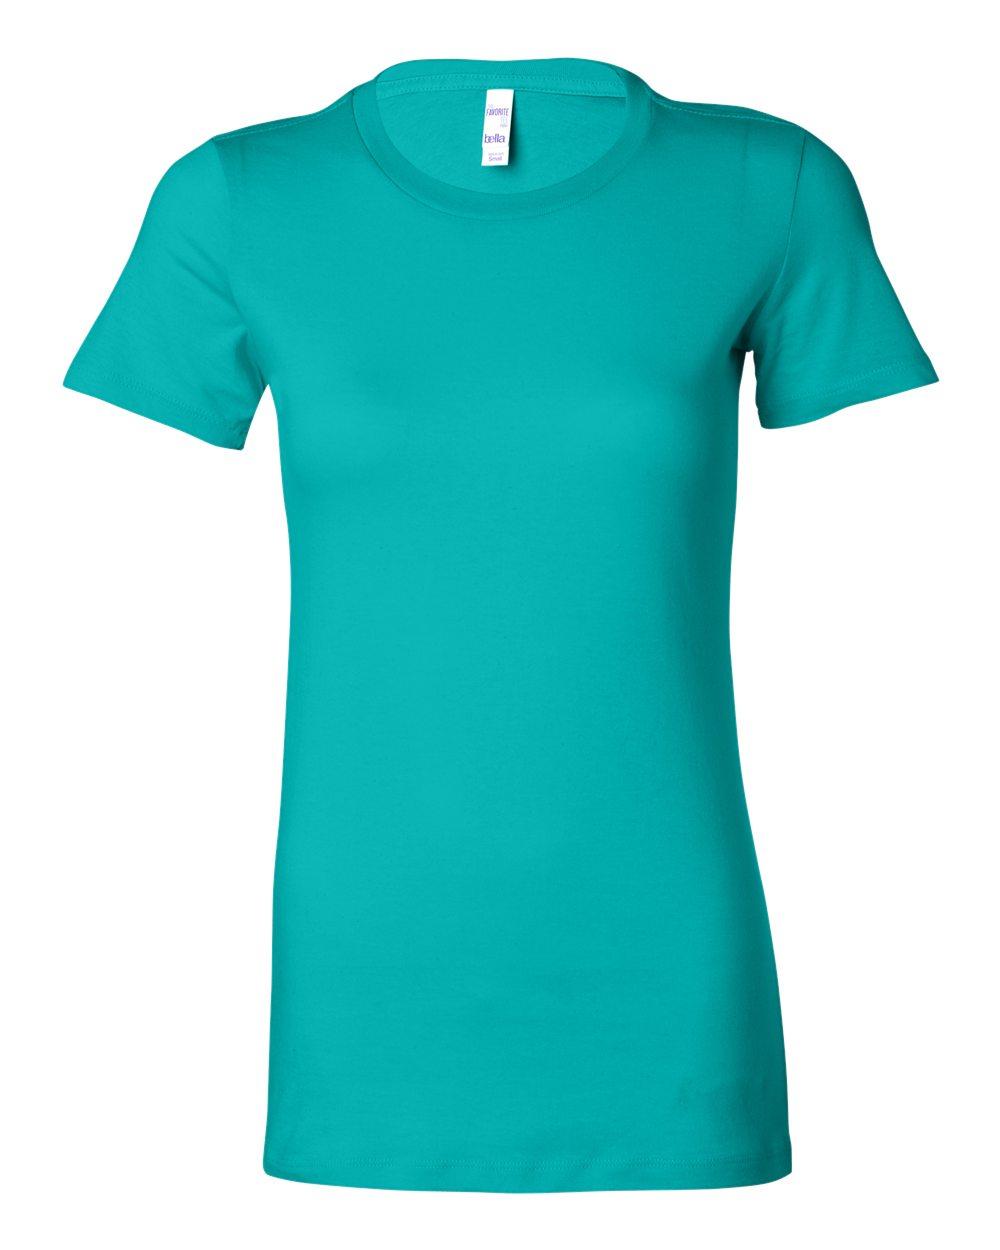 Bella-Canvas-Women-039-s-Favorite-T-Shirt-6004-S-2XL thumbnail 11